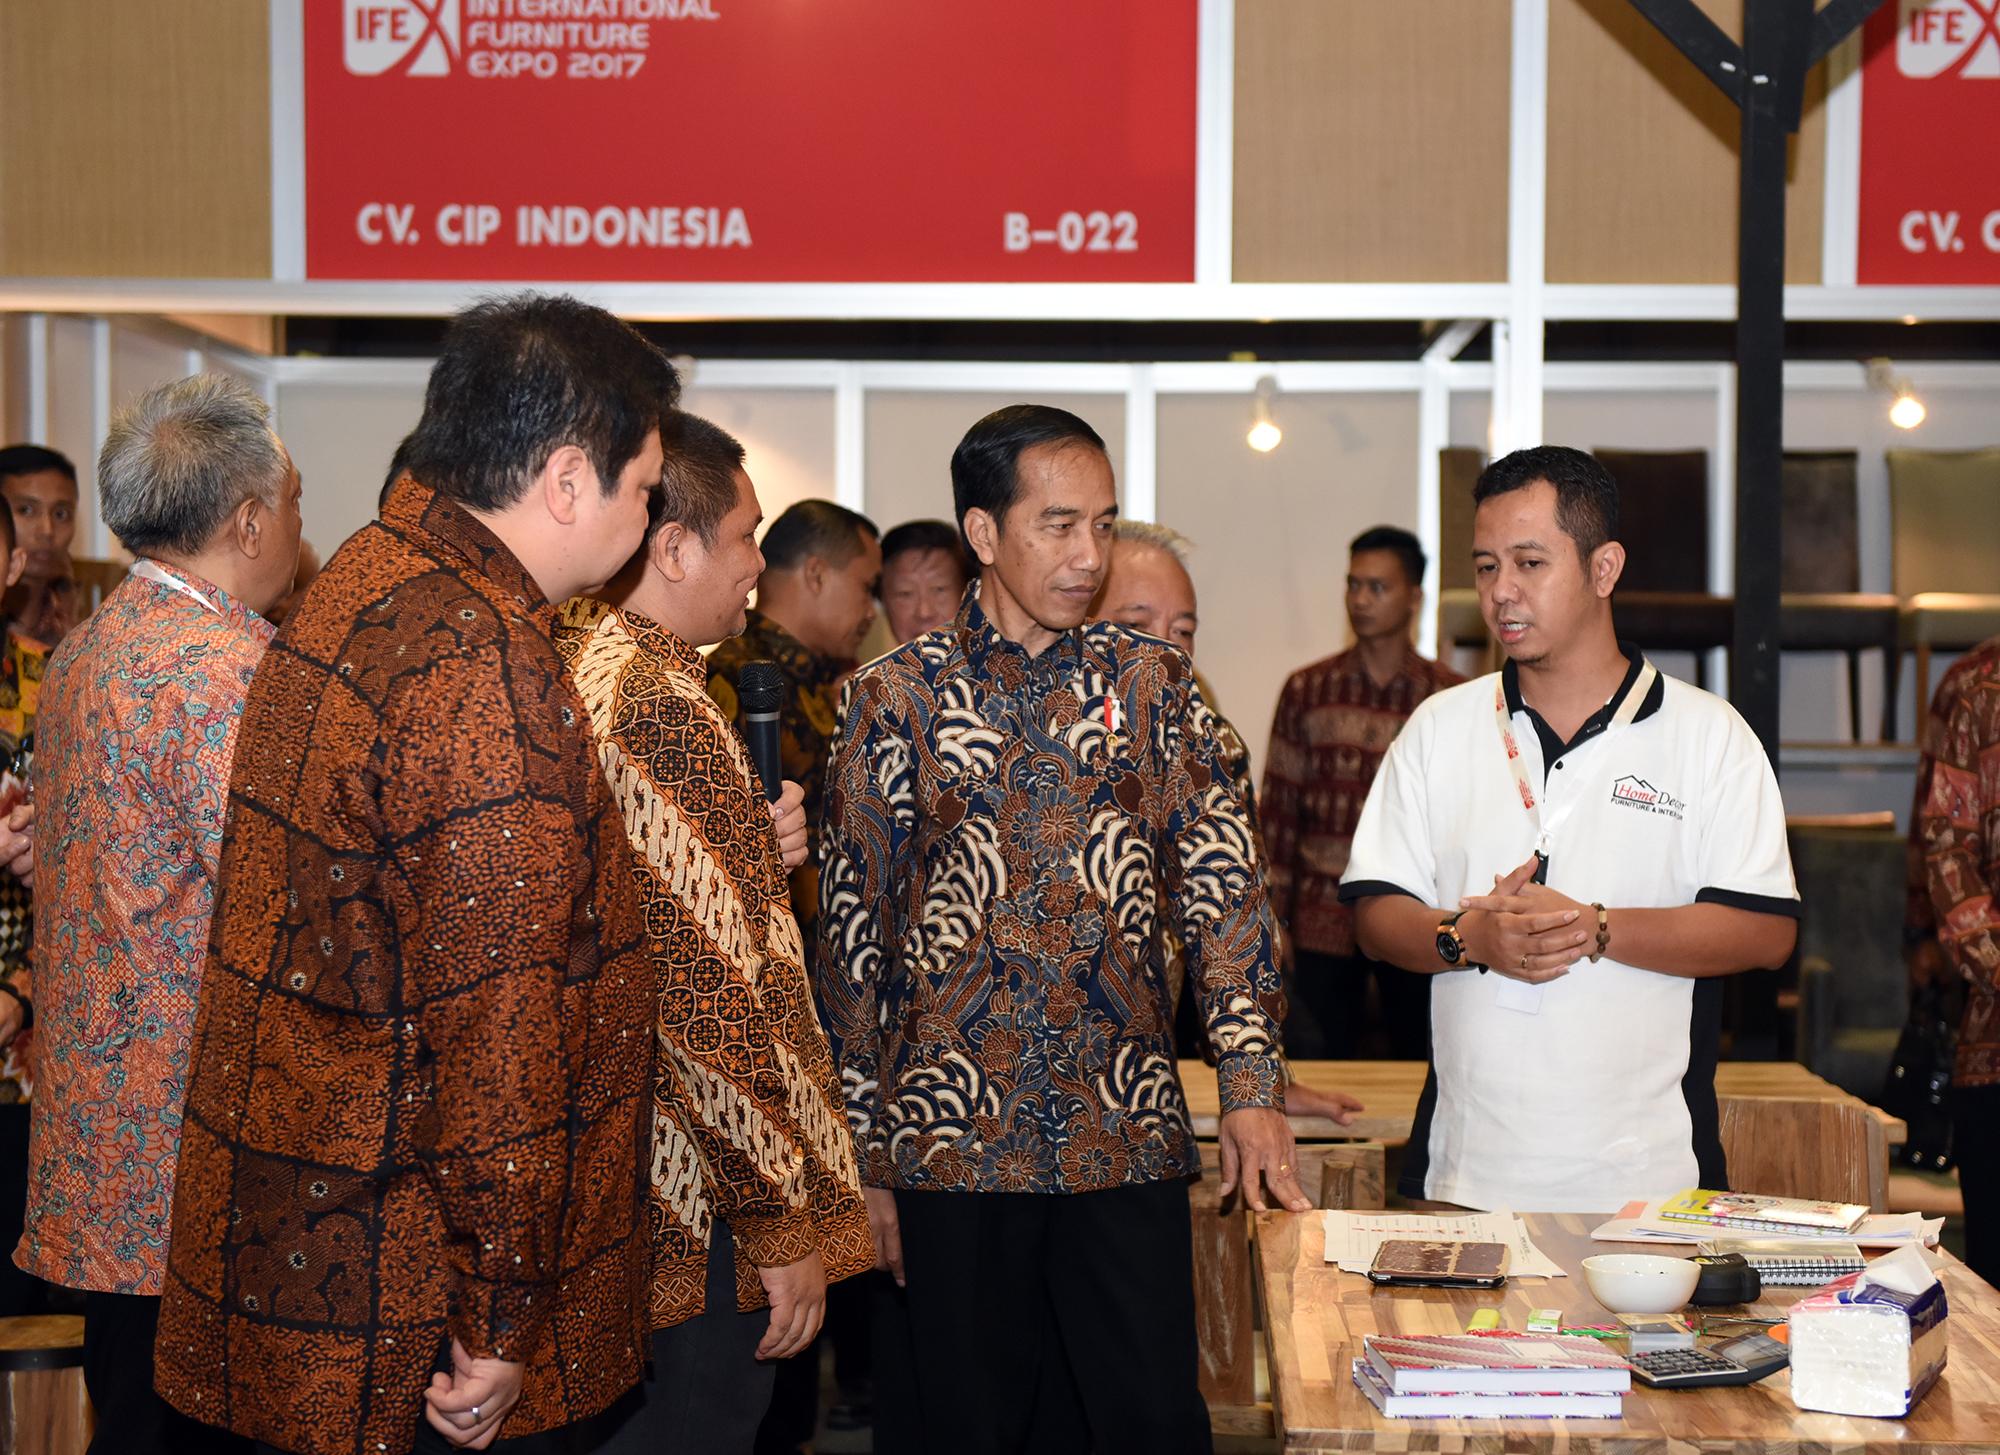 Presiden Jokowi meninjau Pameran IFEX 2017, di Ji-Expo Kemayoran, Jakarta, Sabtu (11/3) pagi. (Foto: Humas/Anggun)